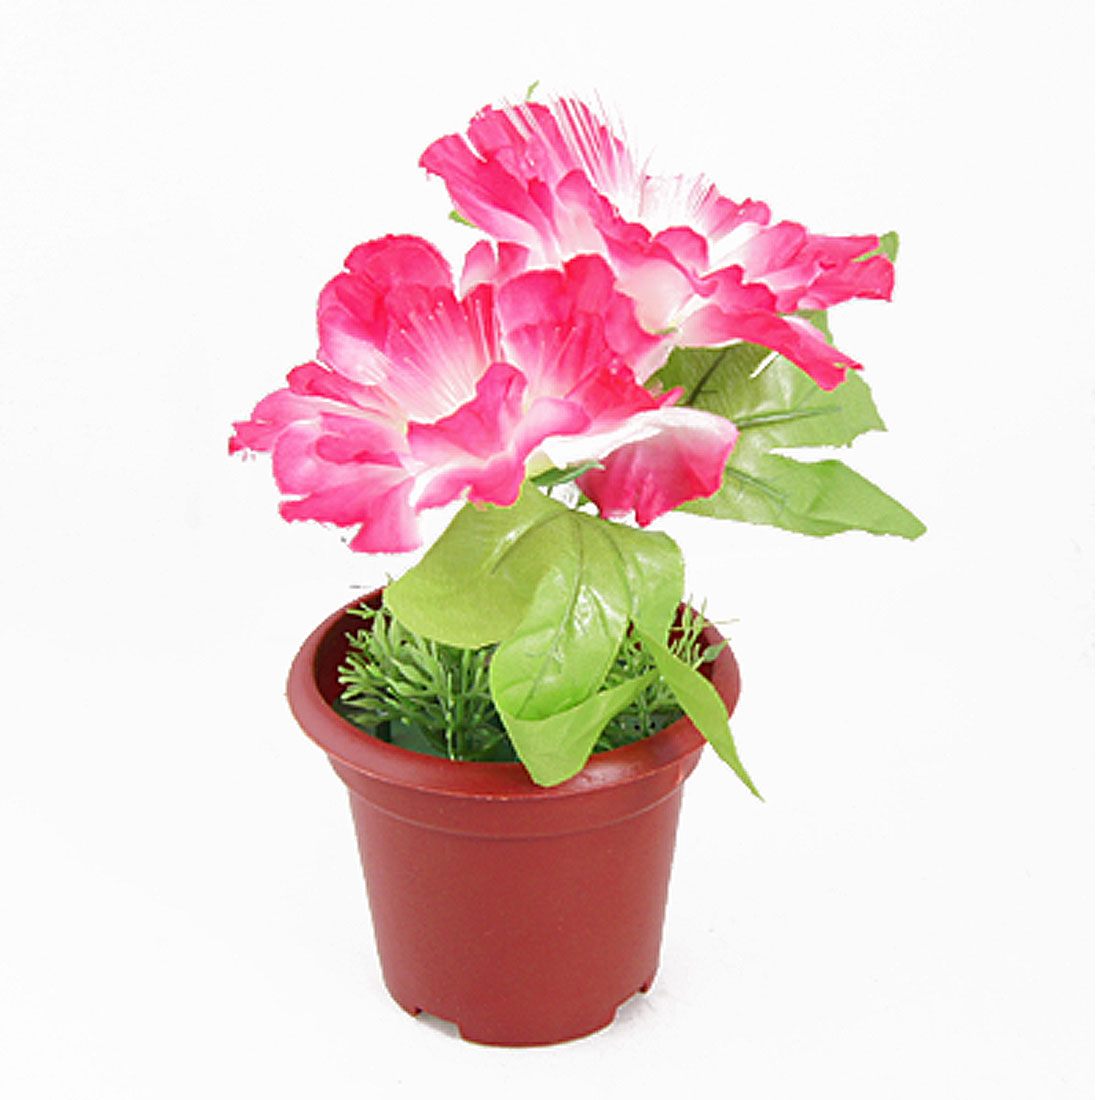 Home Plastic Pot Fuchsia White Flower Flashlight Lamp Desktop Decor